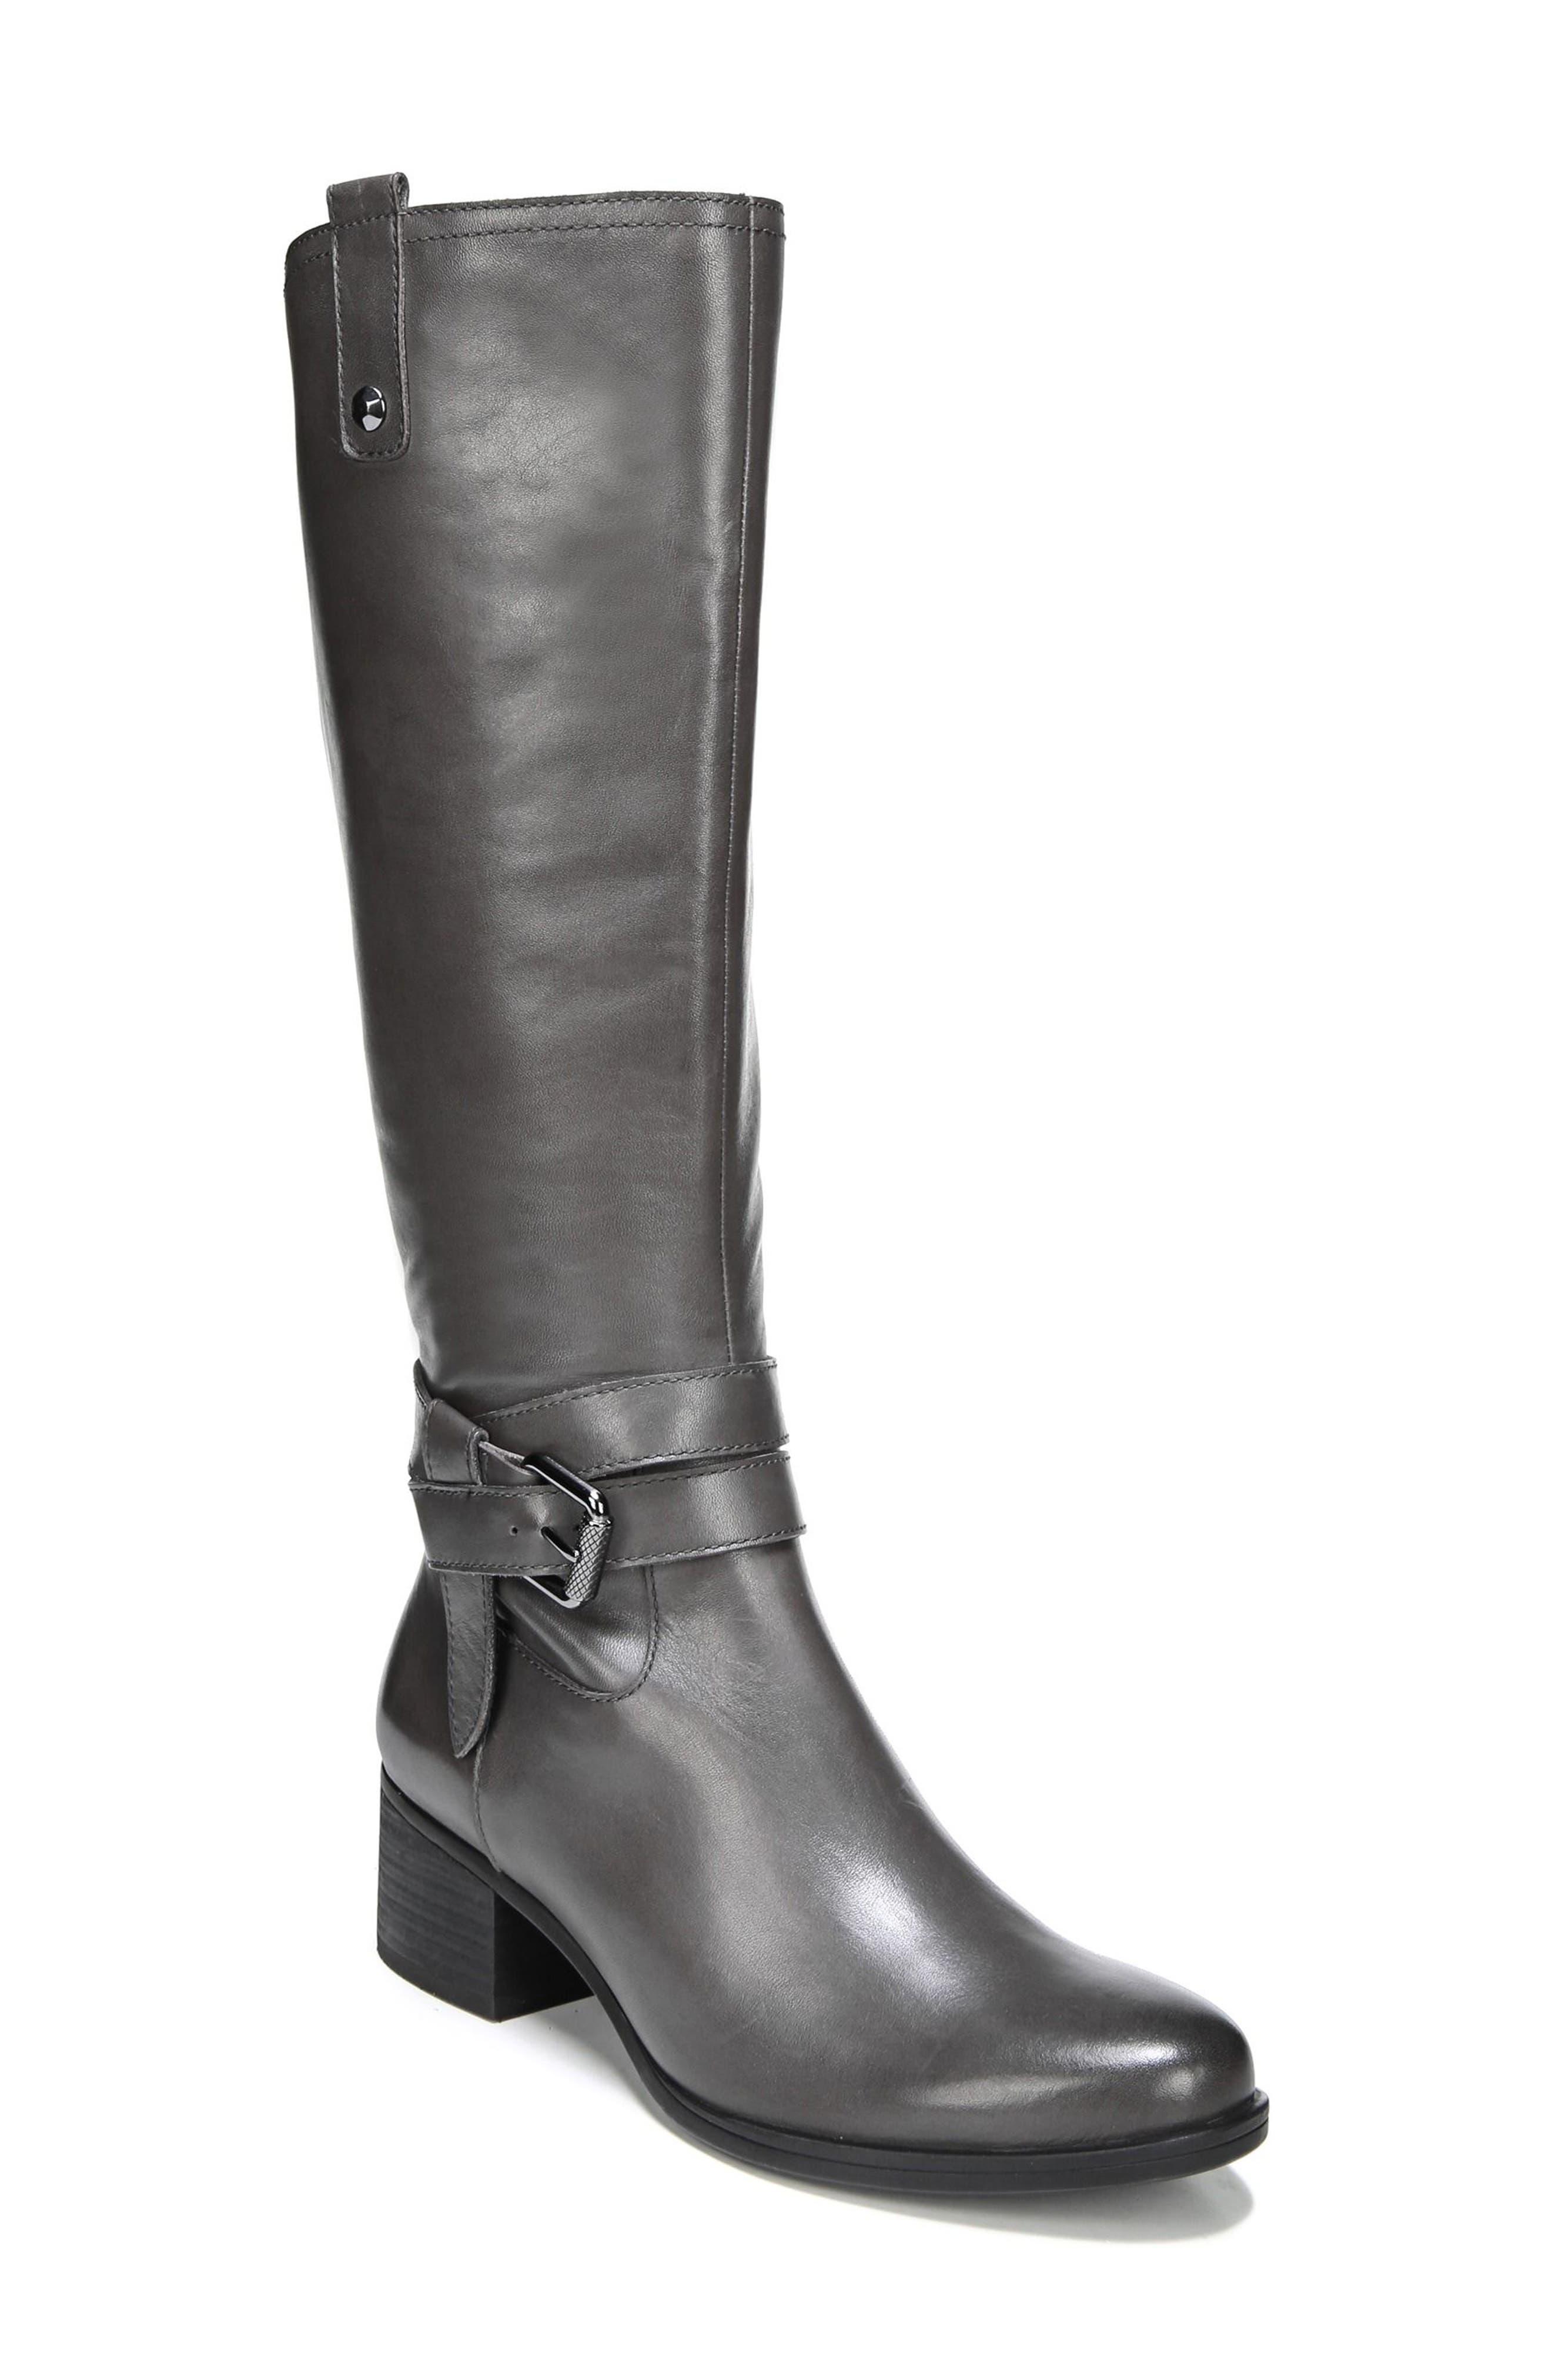 Main Image - Naturalizer Dev Buckle Strap Boot (Women) (Regular & Wide Calf)